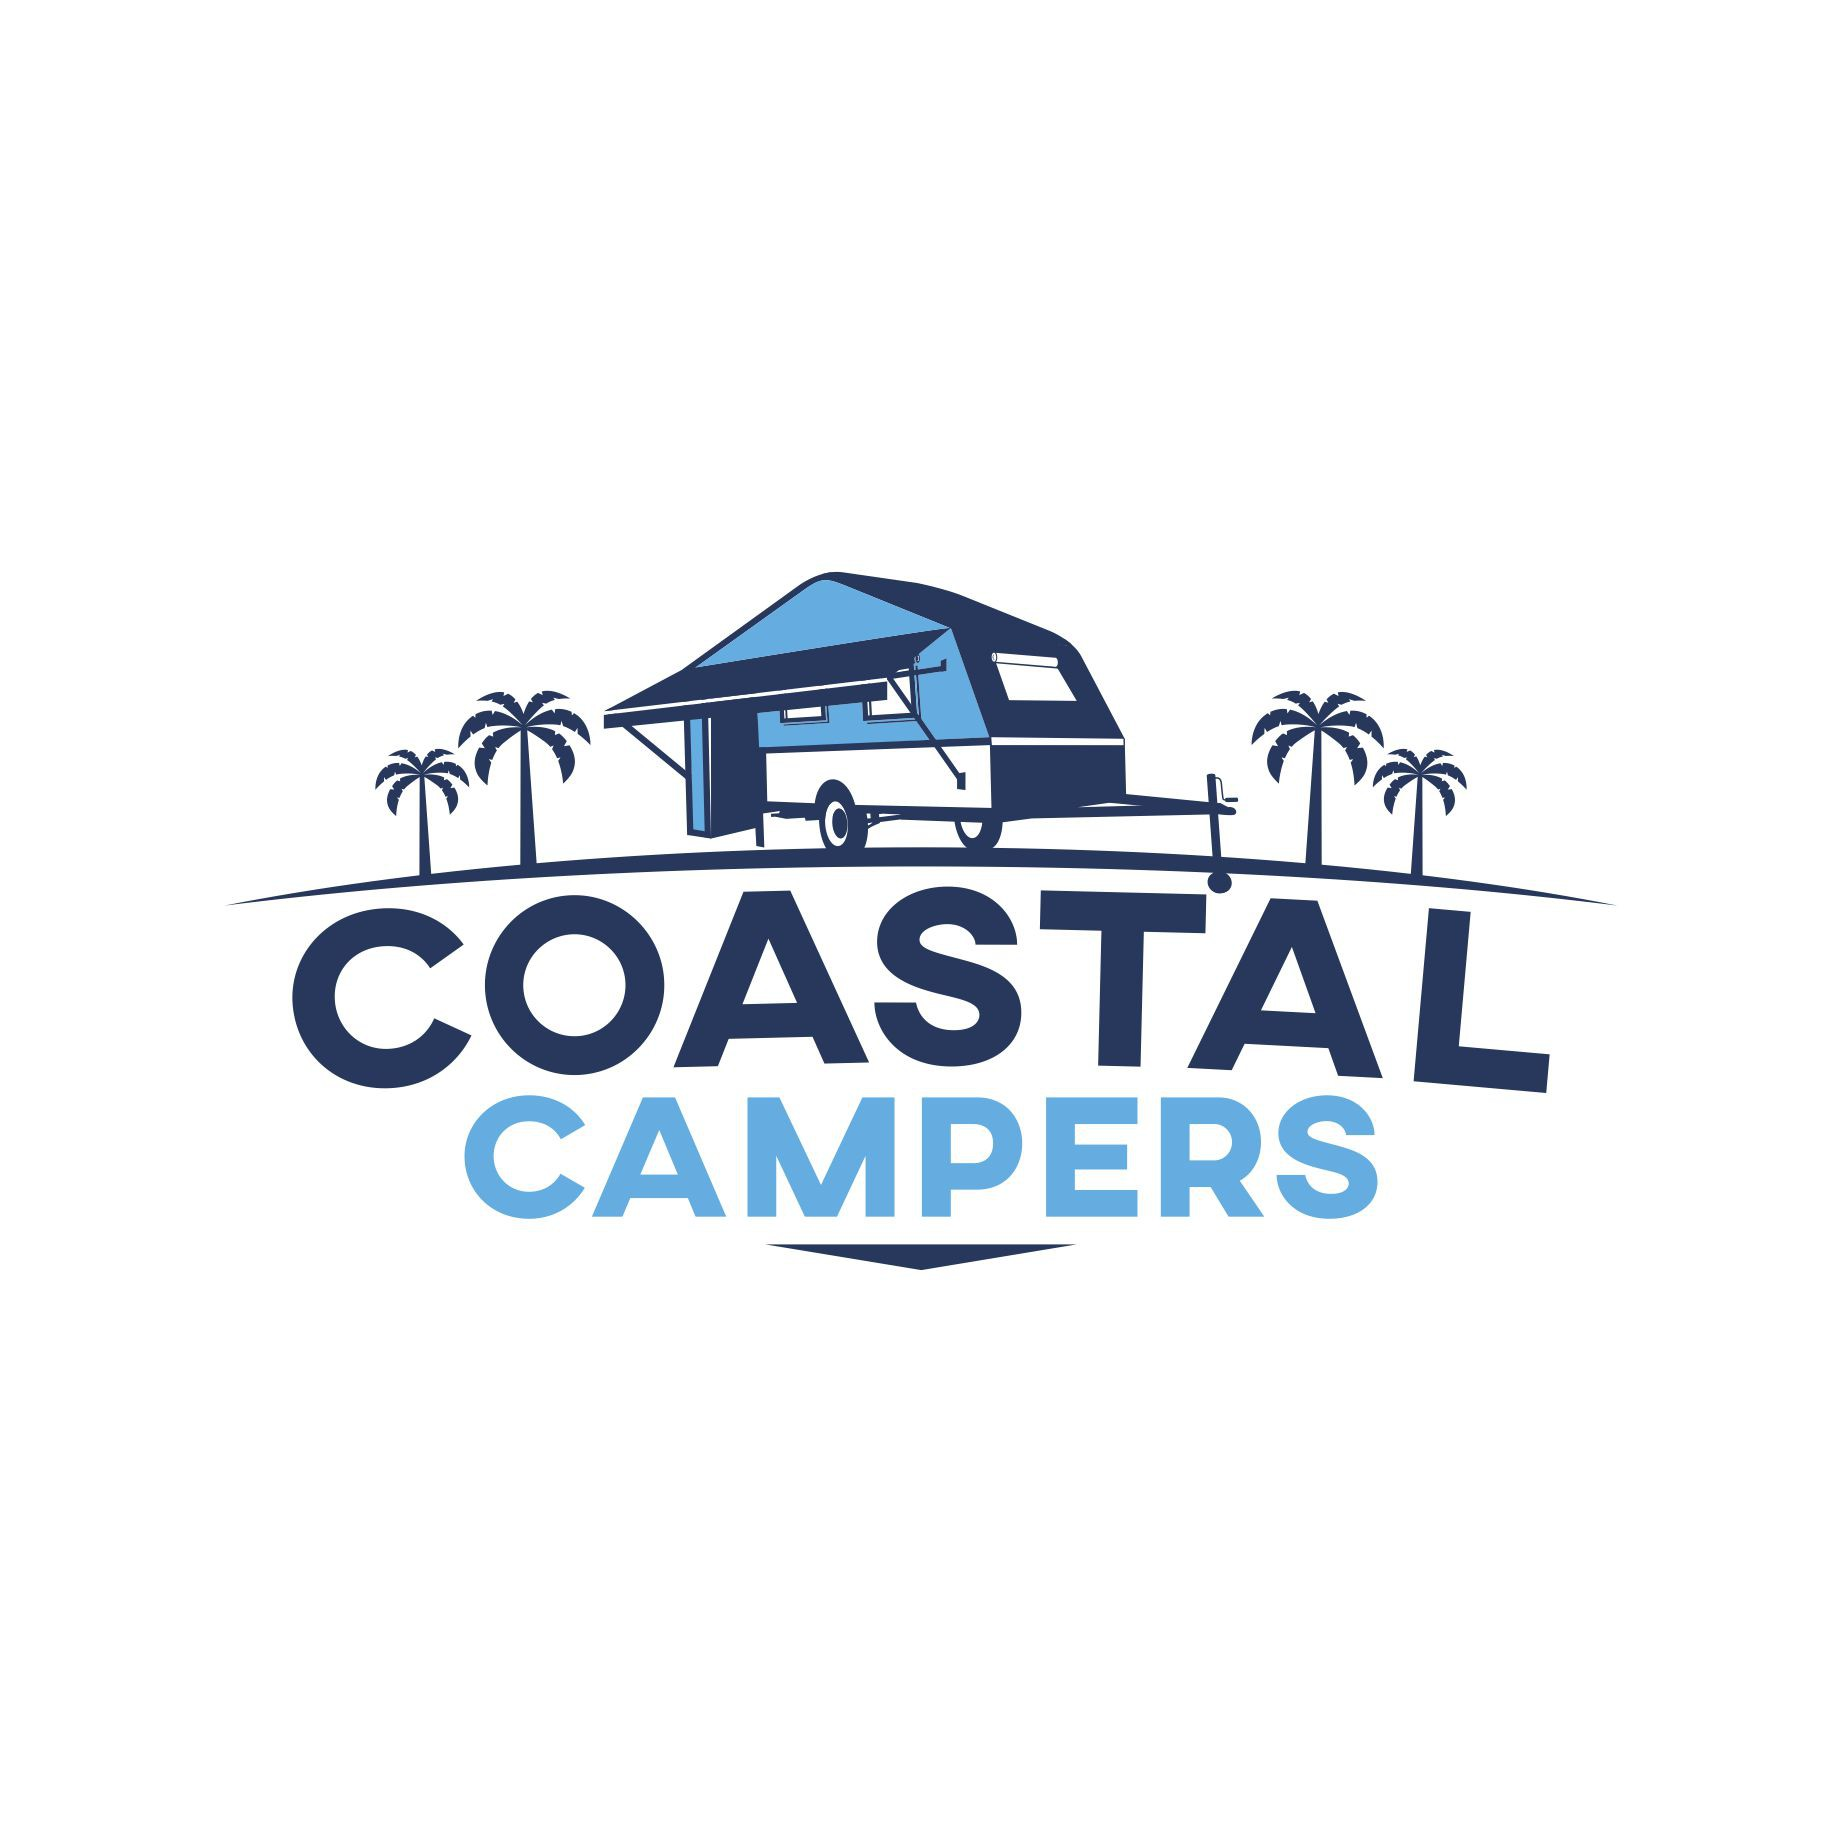 Design a company logo for a camper trailer hire company for signage, digital and print media.